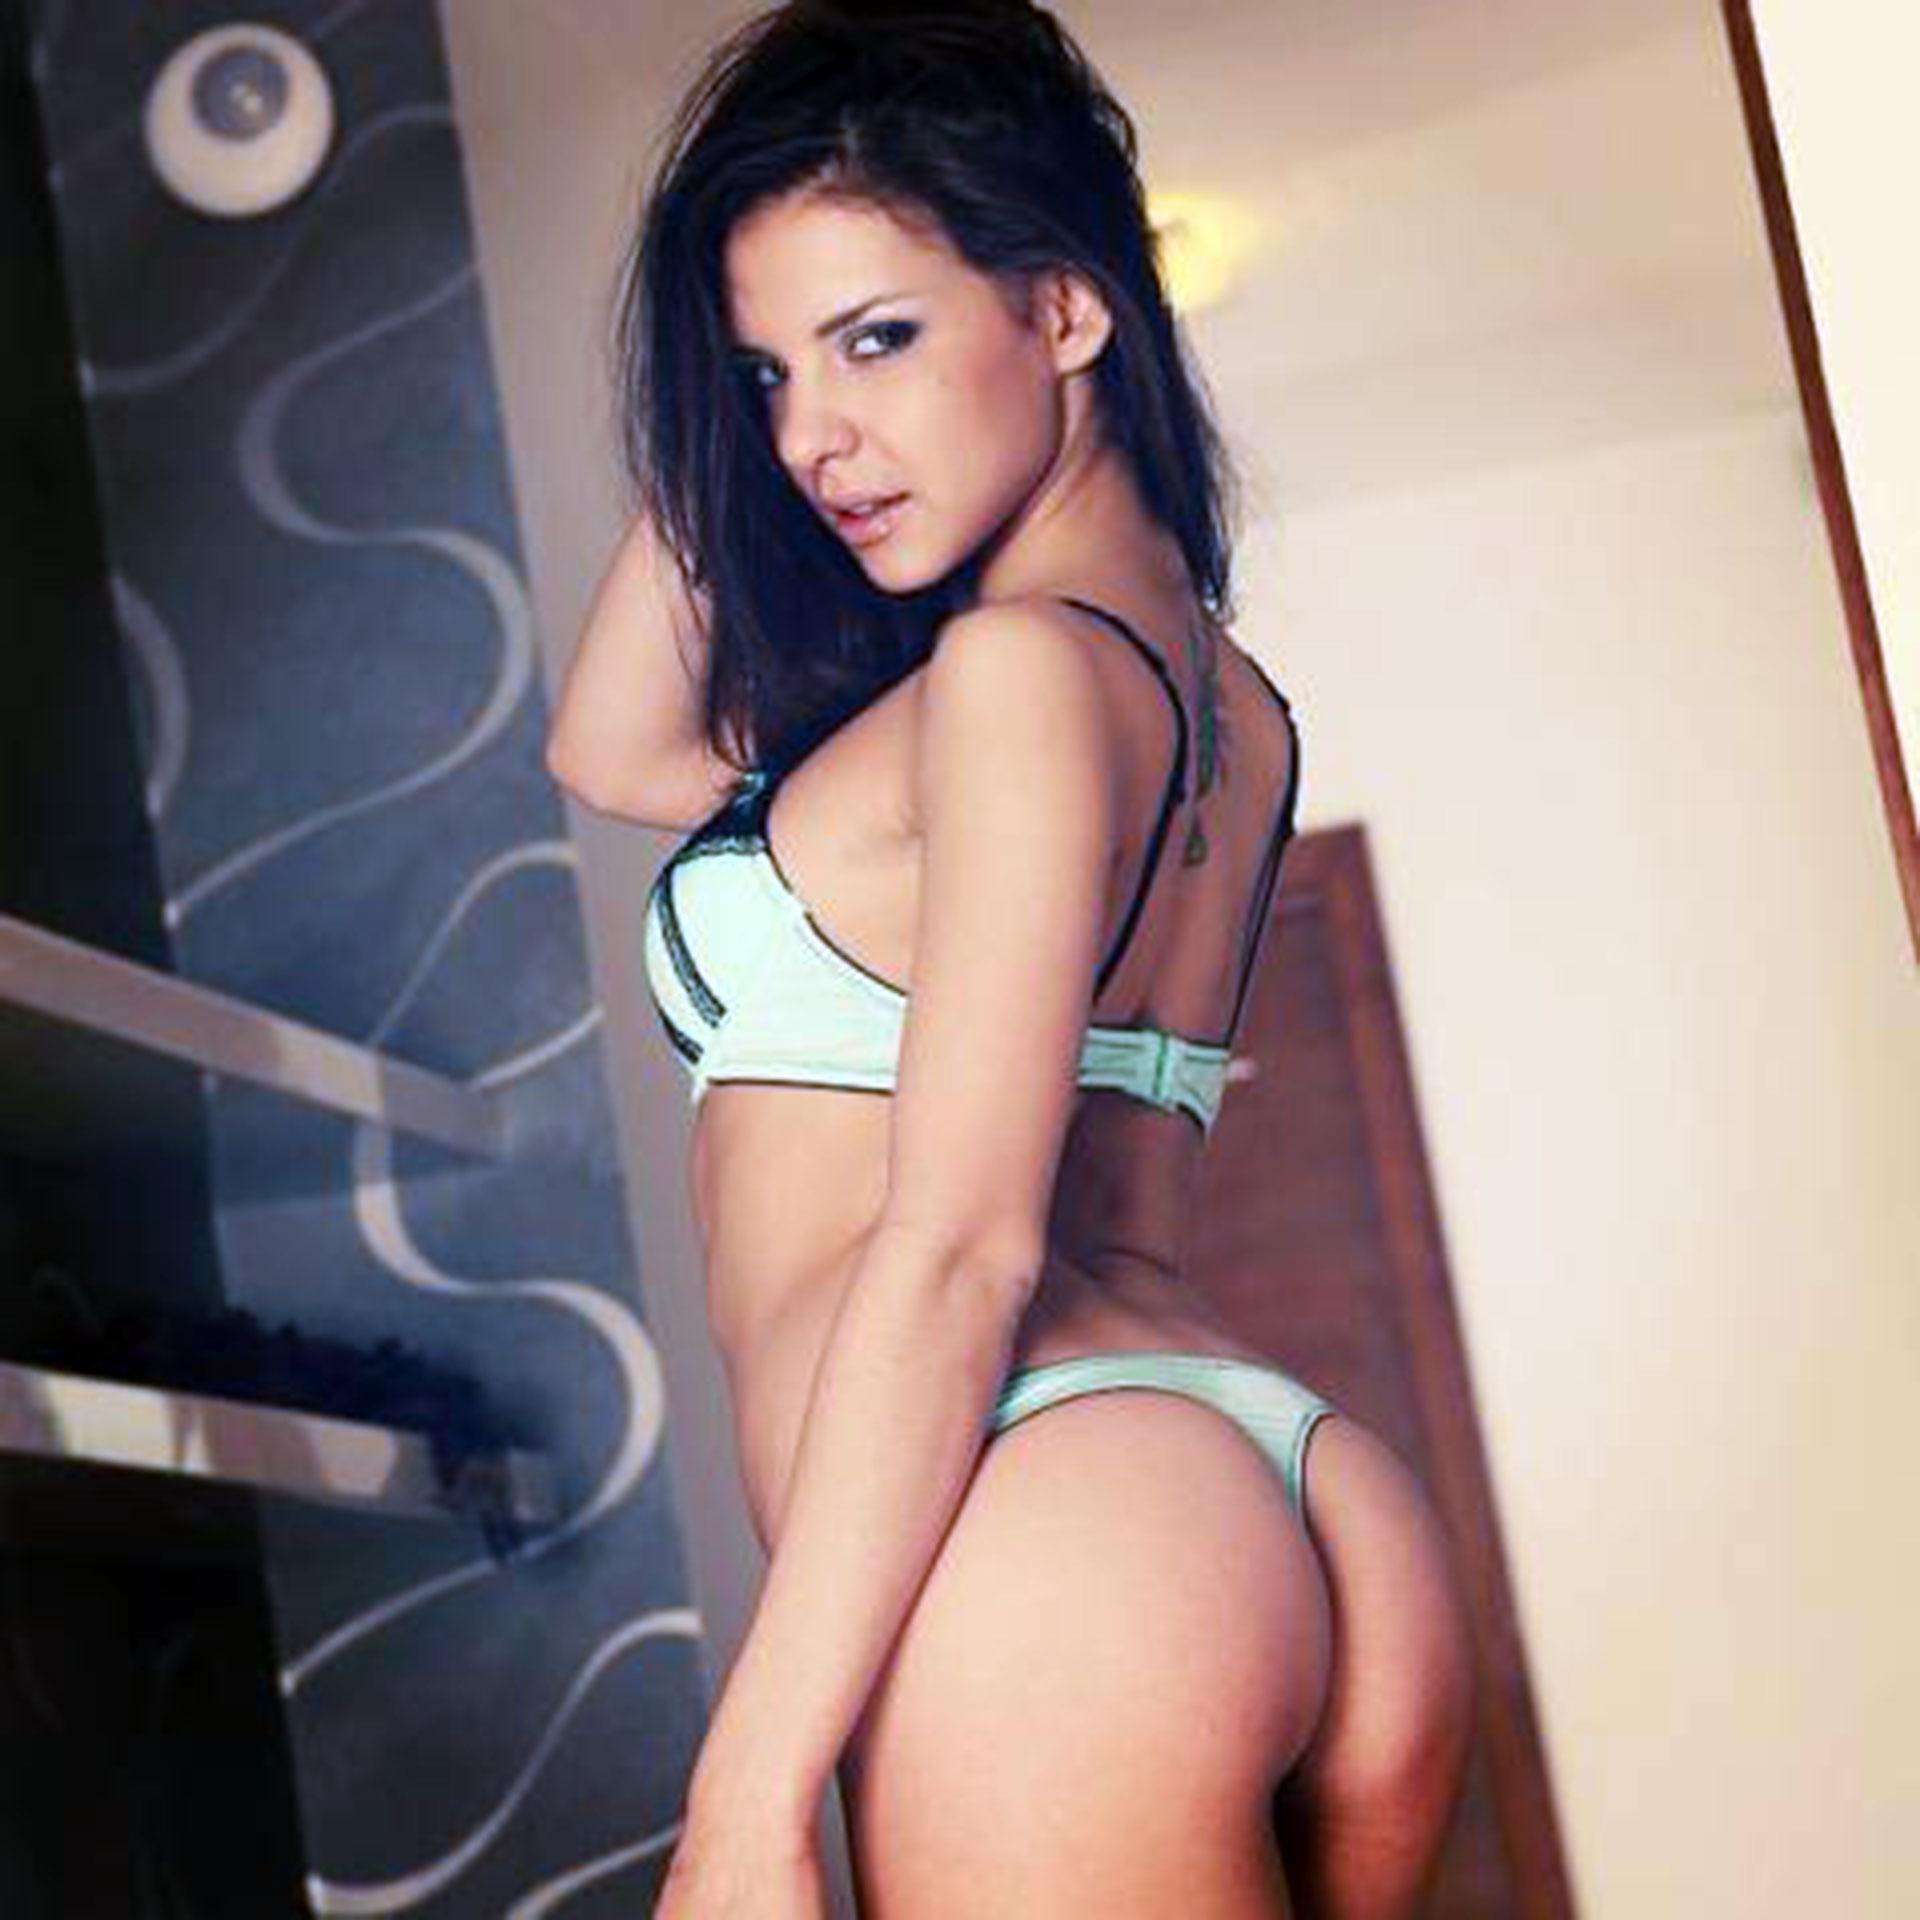 Actrices Porno Rusas Joven actriz porno rusa le ofreció 16 horas de sexo al goleador